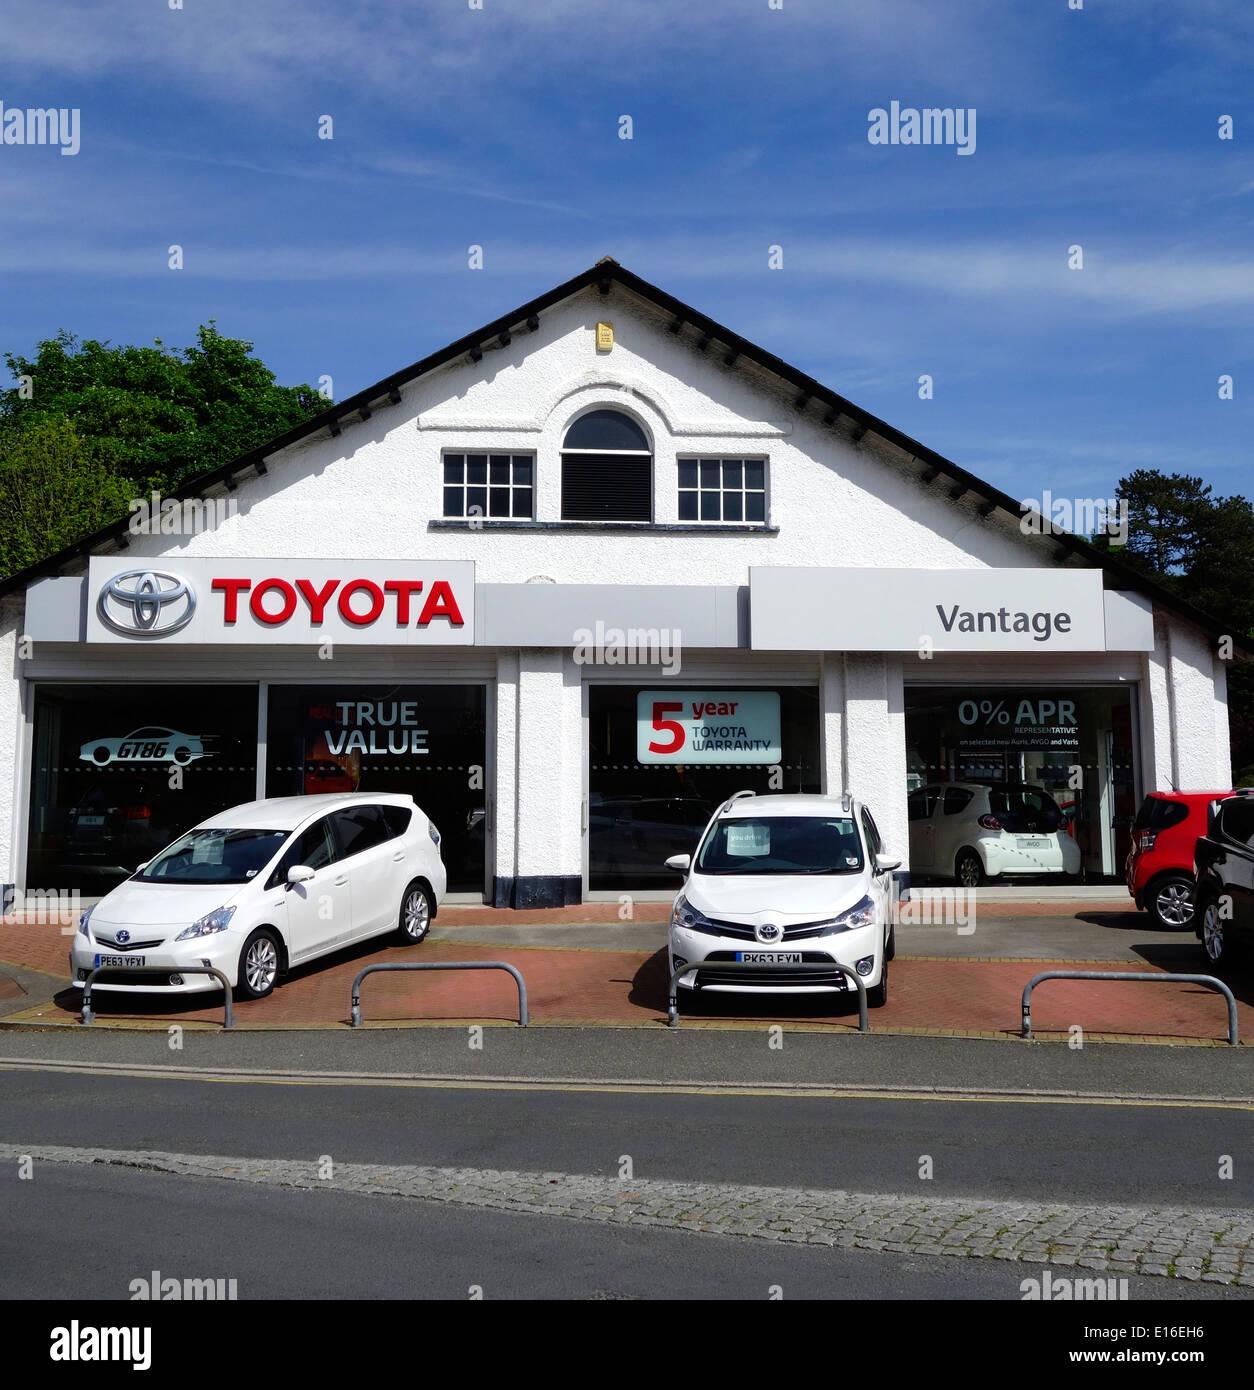 Toyota Showroom Stock Photos & Toyota Showroom Stock